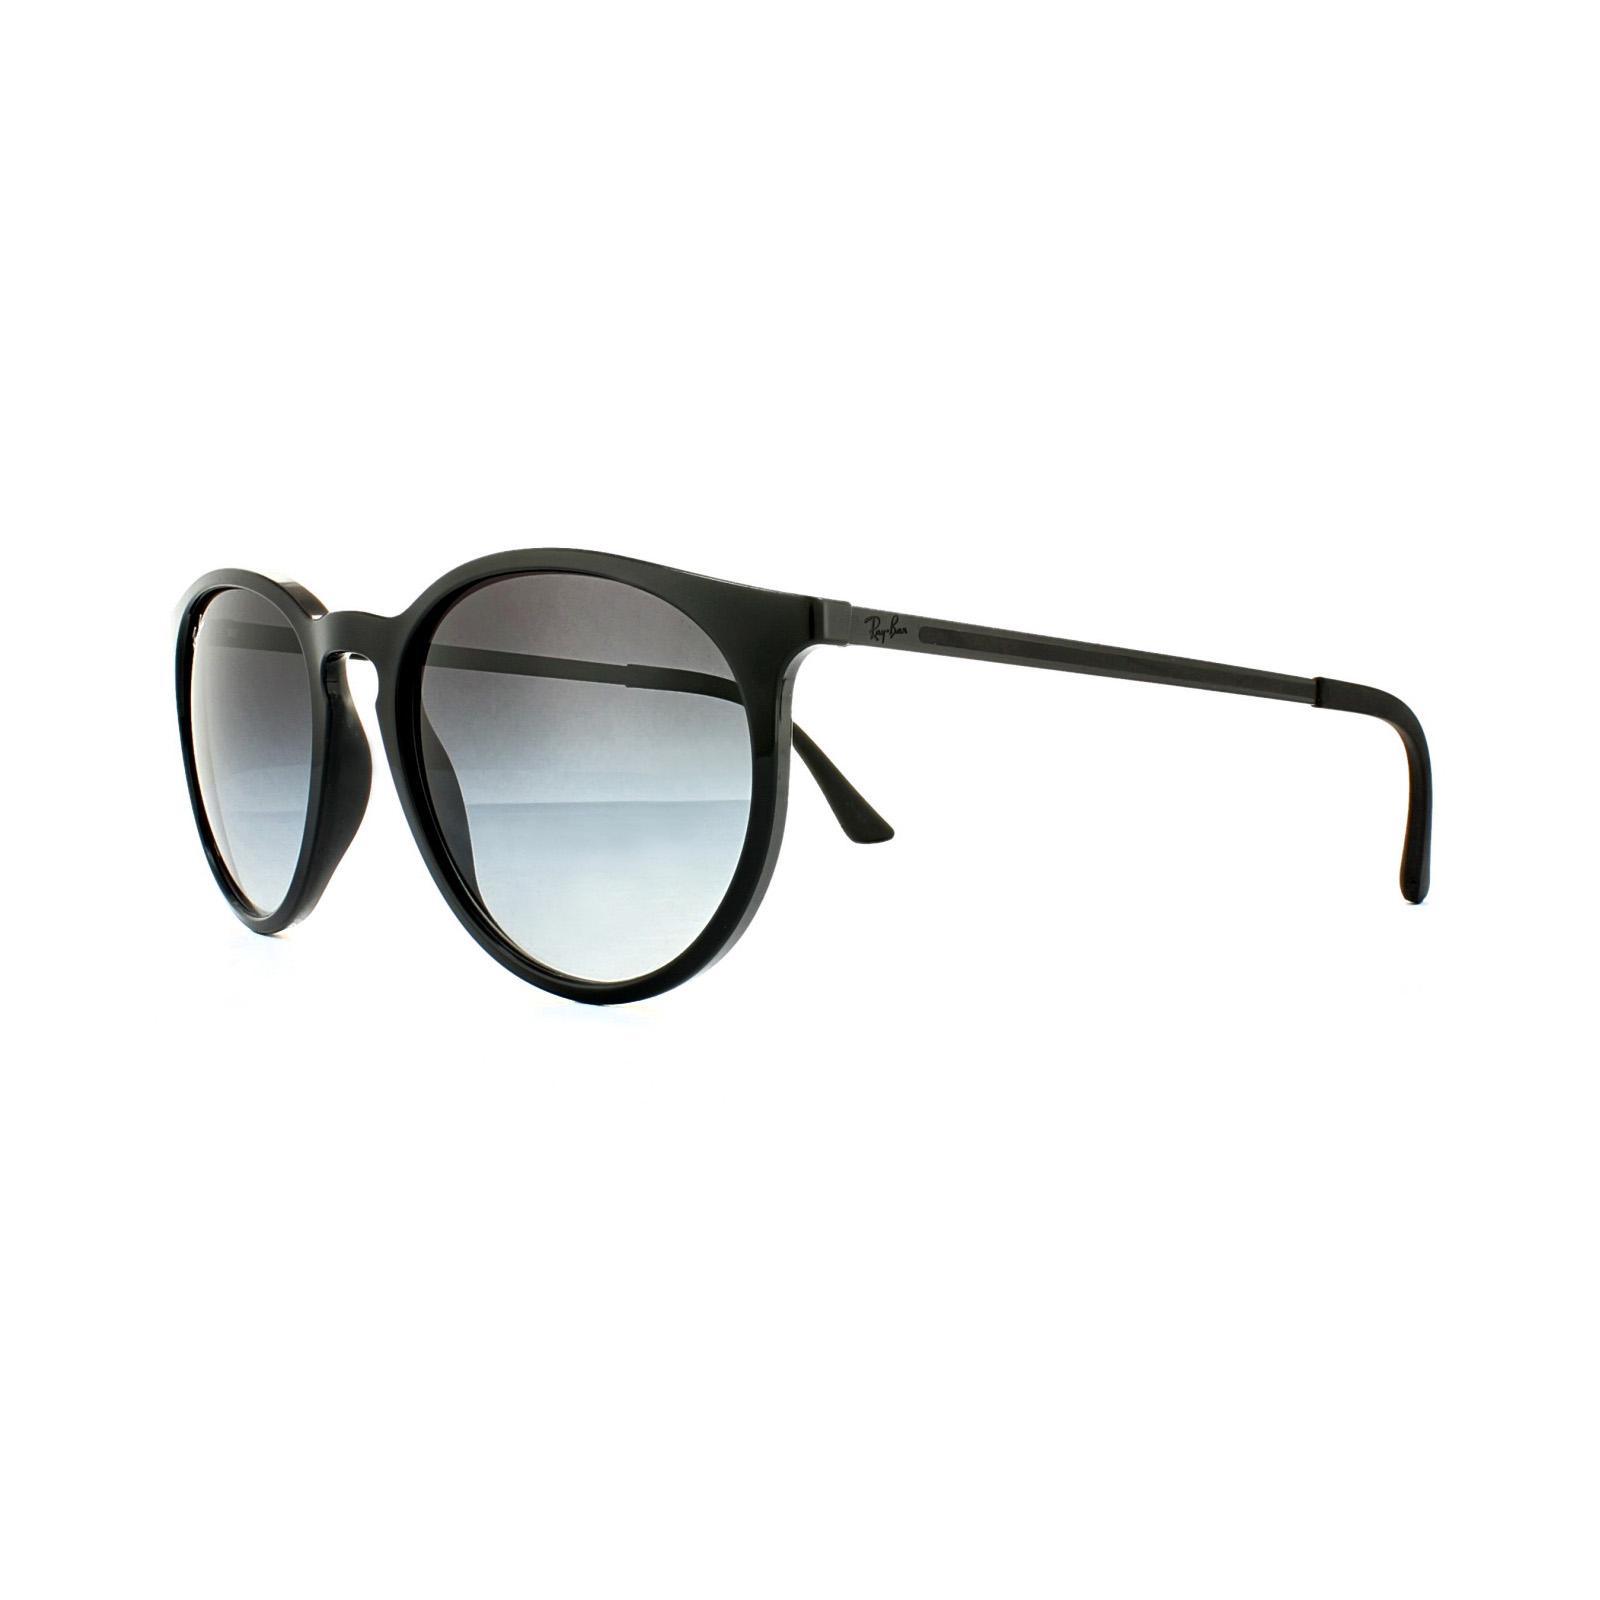 RAY BAN RAY-BAN Sonnenbrille » RB4274«, schwarz, 601/8G - schwarz/grau